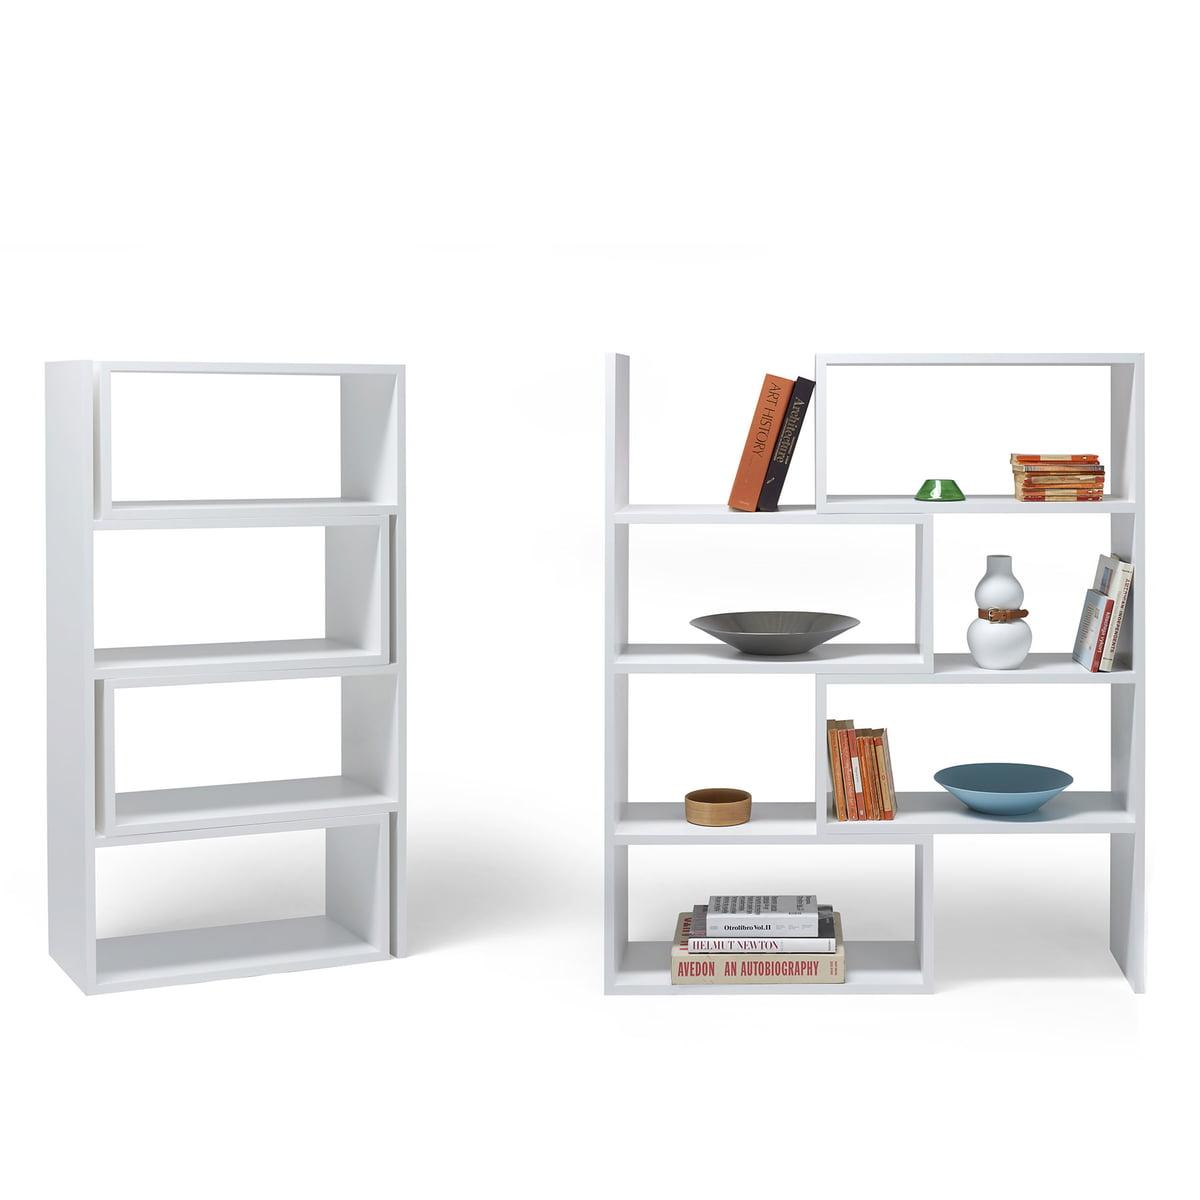 extend regal von design house stockholm kaufen. Black Bedroom Furniture Sets. Home Design Ideas